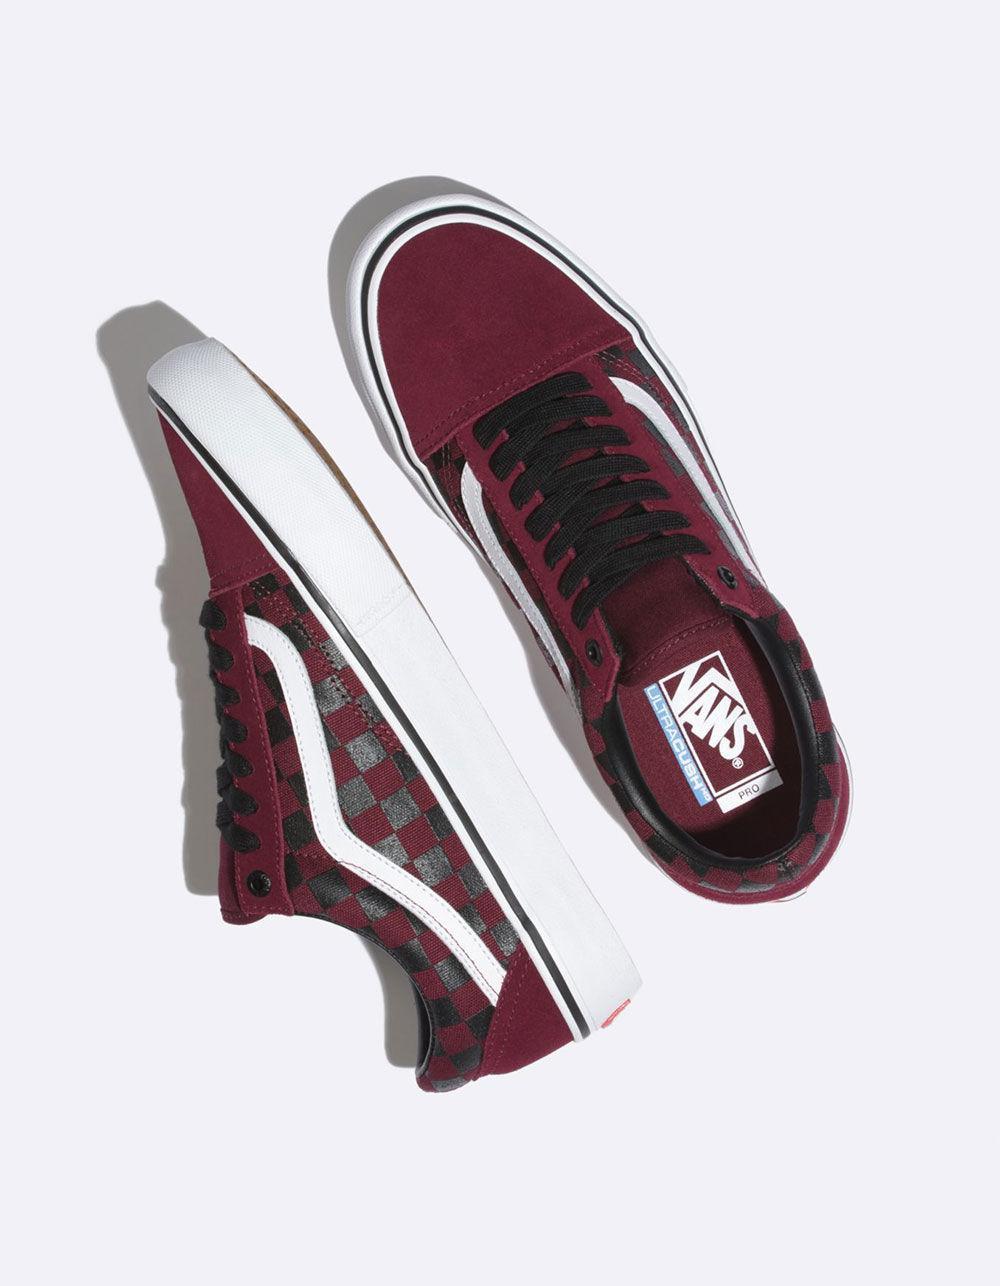 65b482c99ea9 Vans - Multicolor The Rubber Print Old Skool Pro Port Royal Shoes for Men -  Lyst. View fullscreen